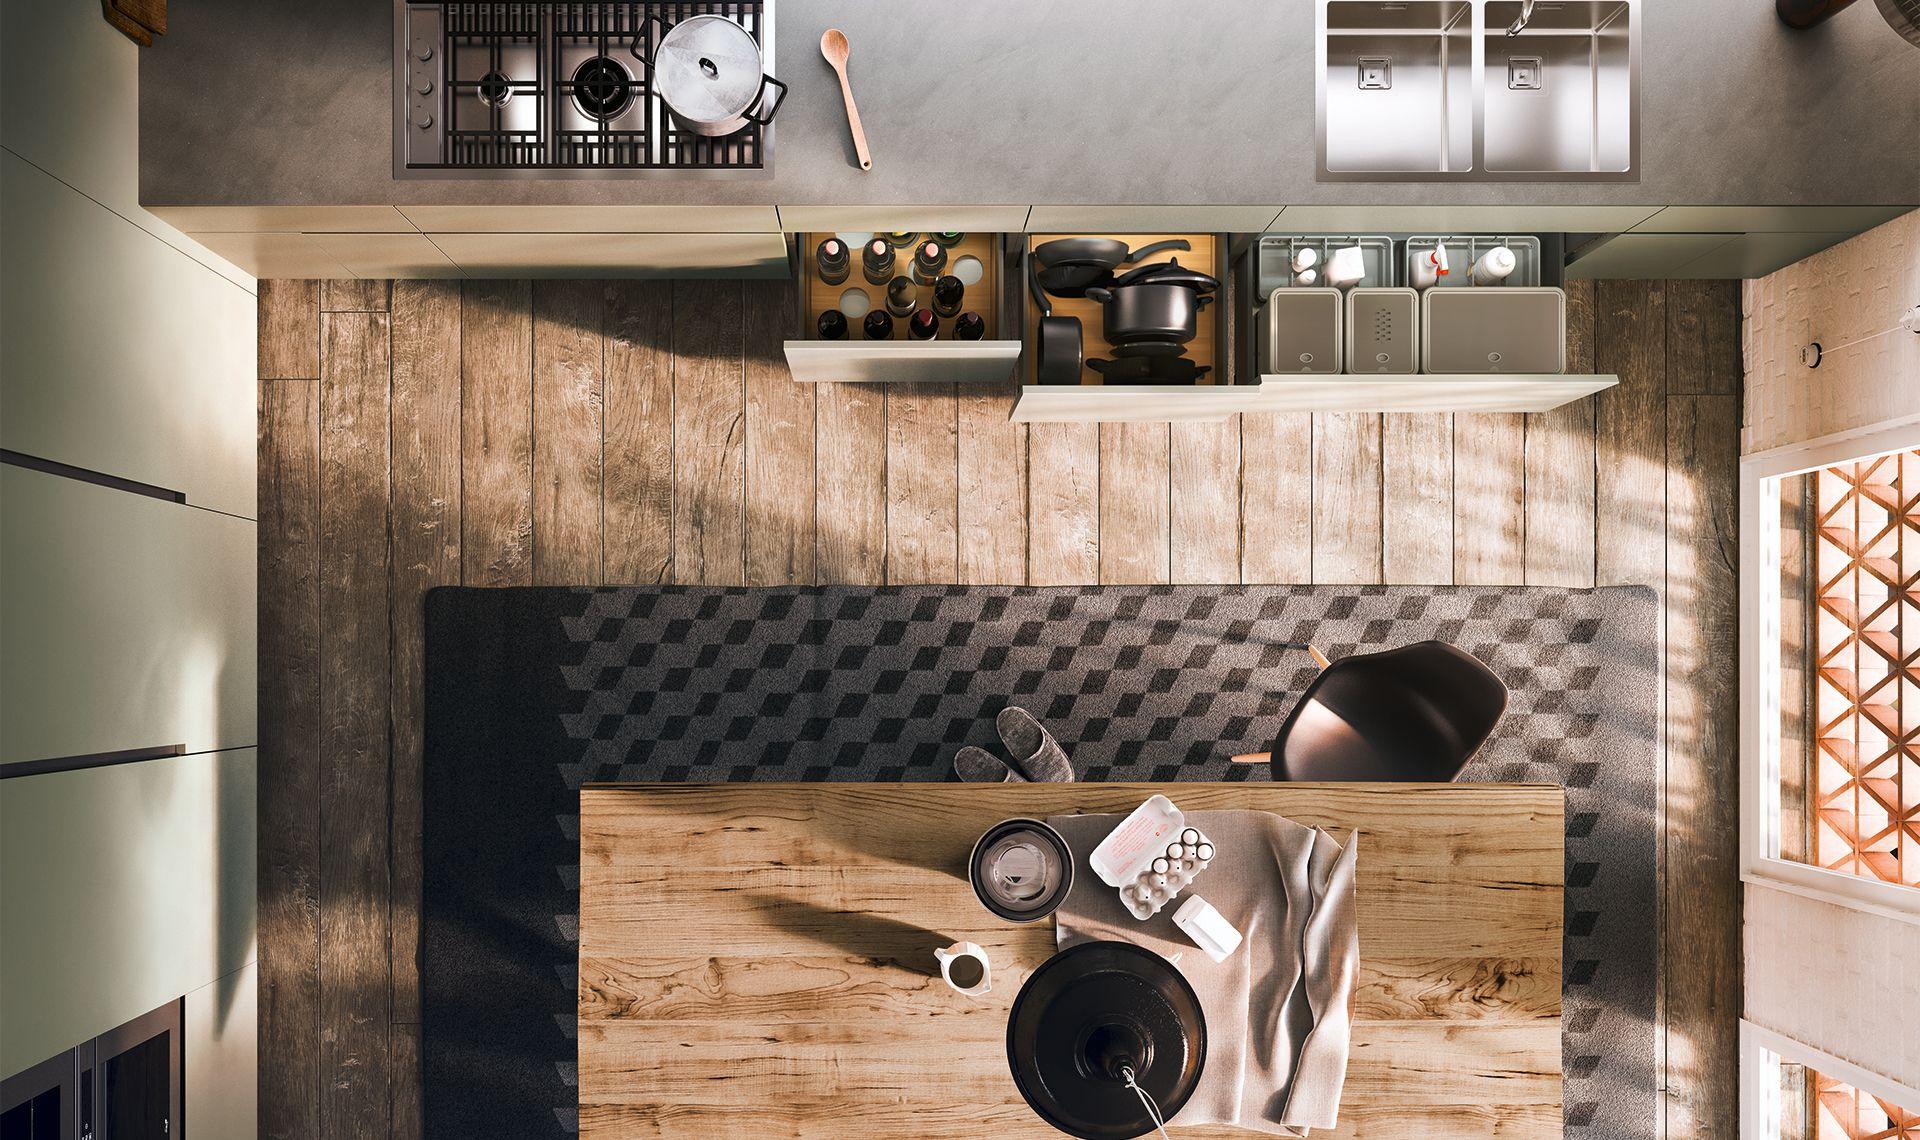 Cucina Rustica Contemporanea : Cucina rustica contemporanea